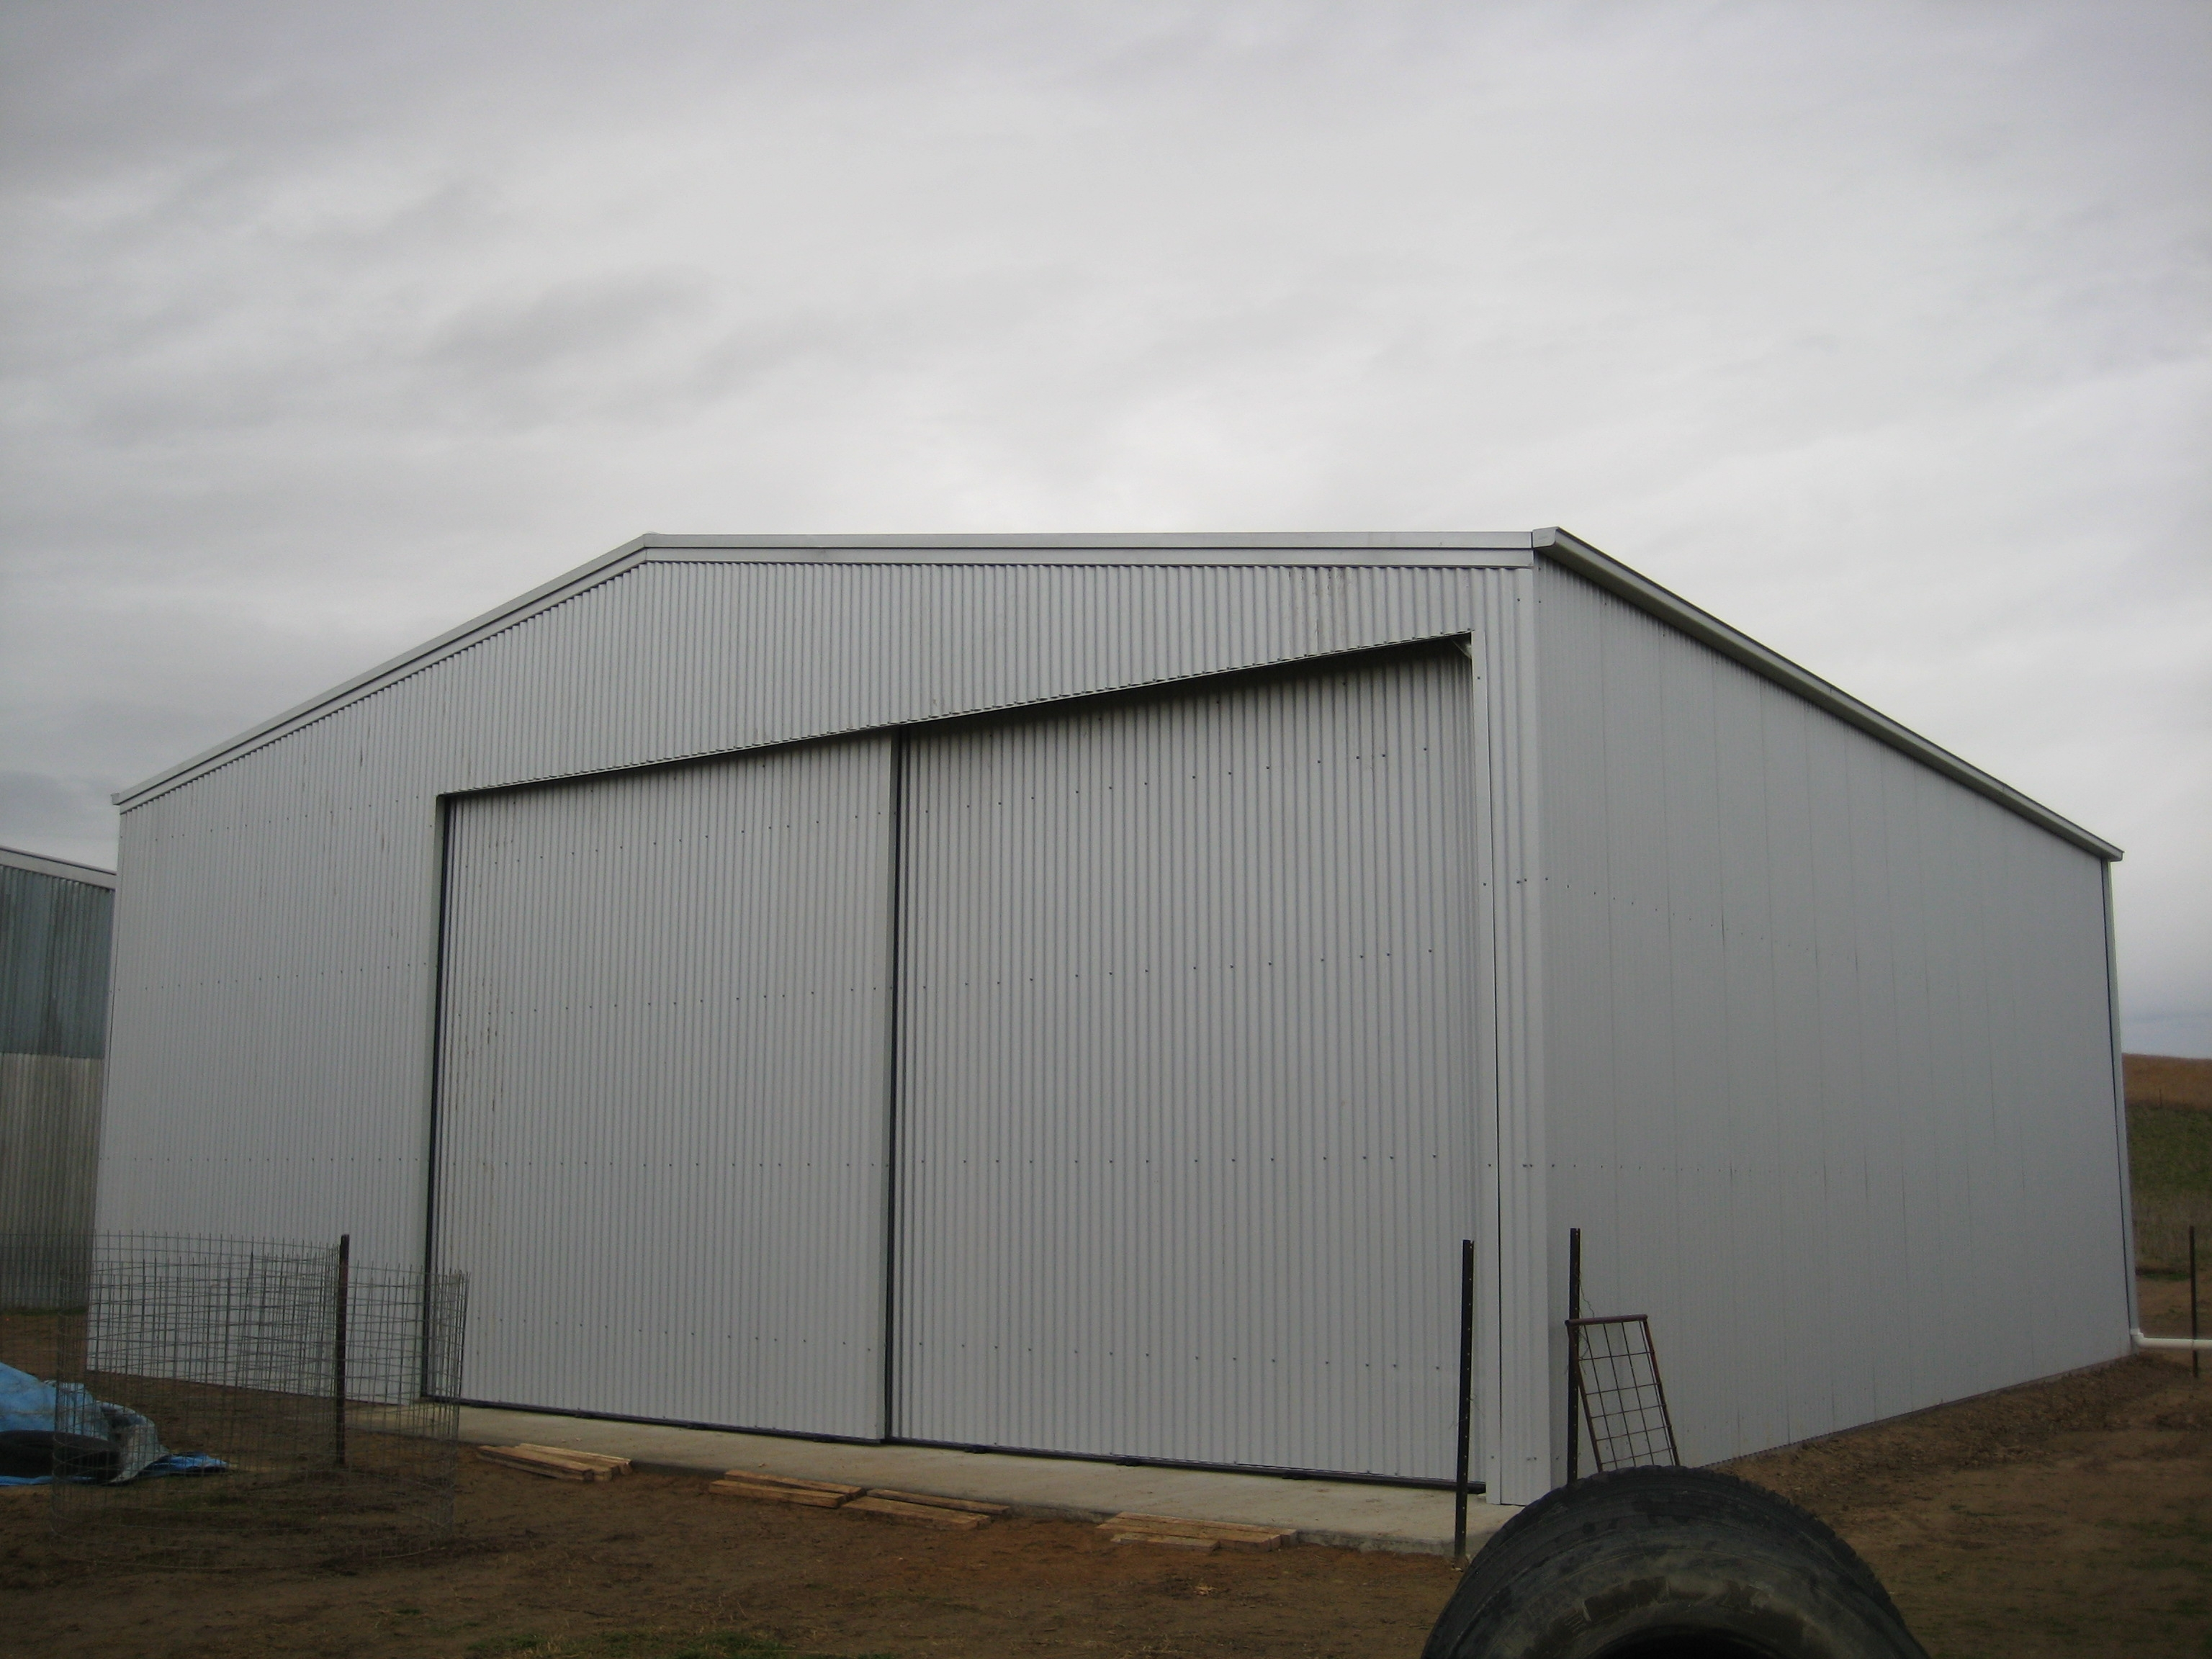 Farm Shed Sliding Doors3072 X 2304